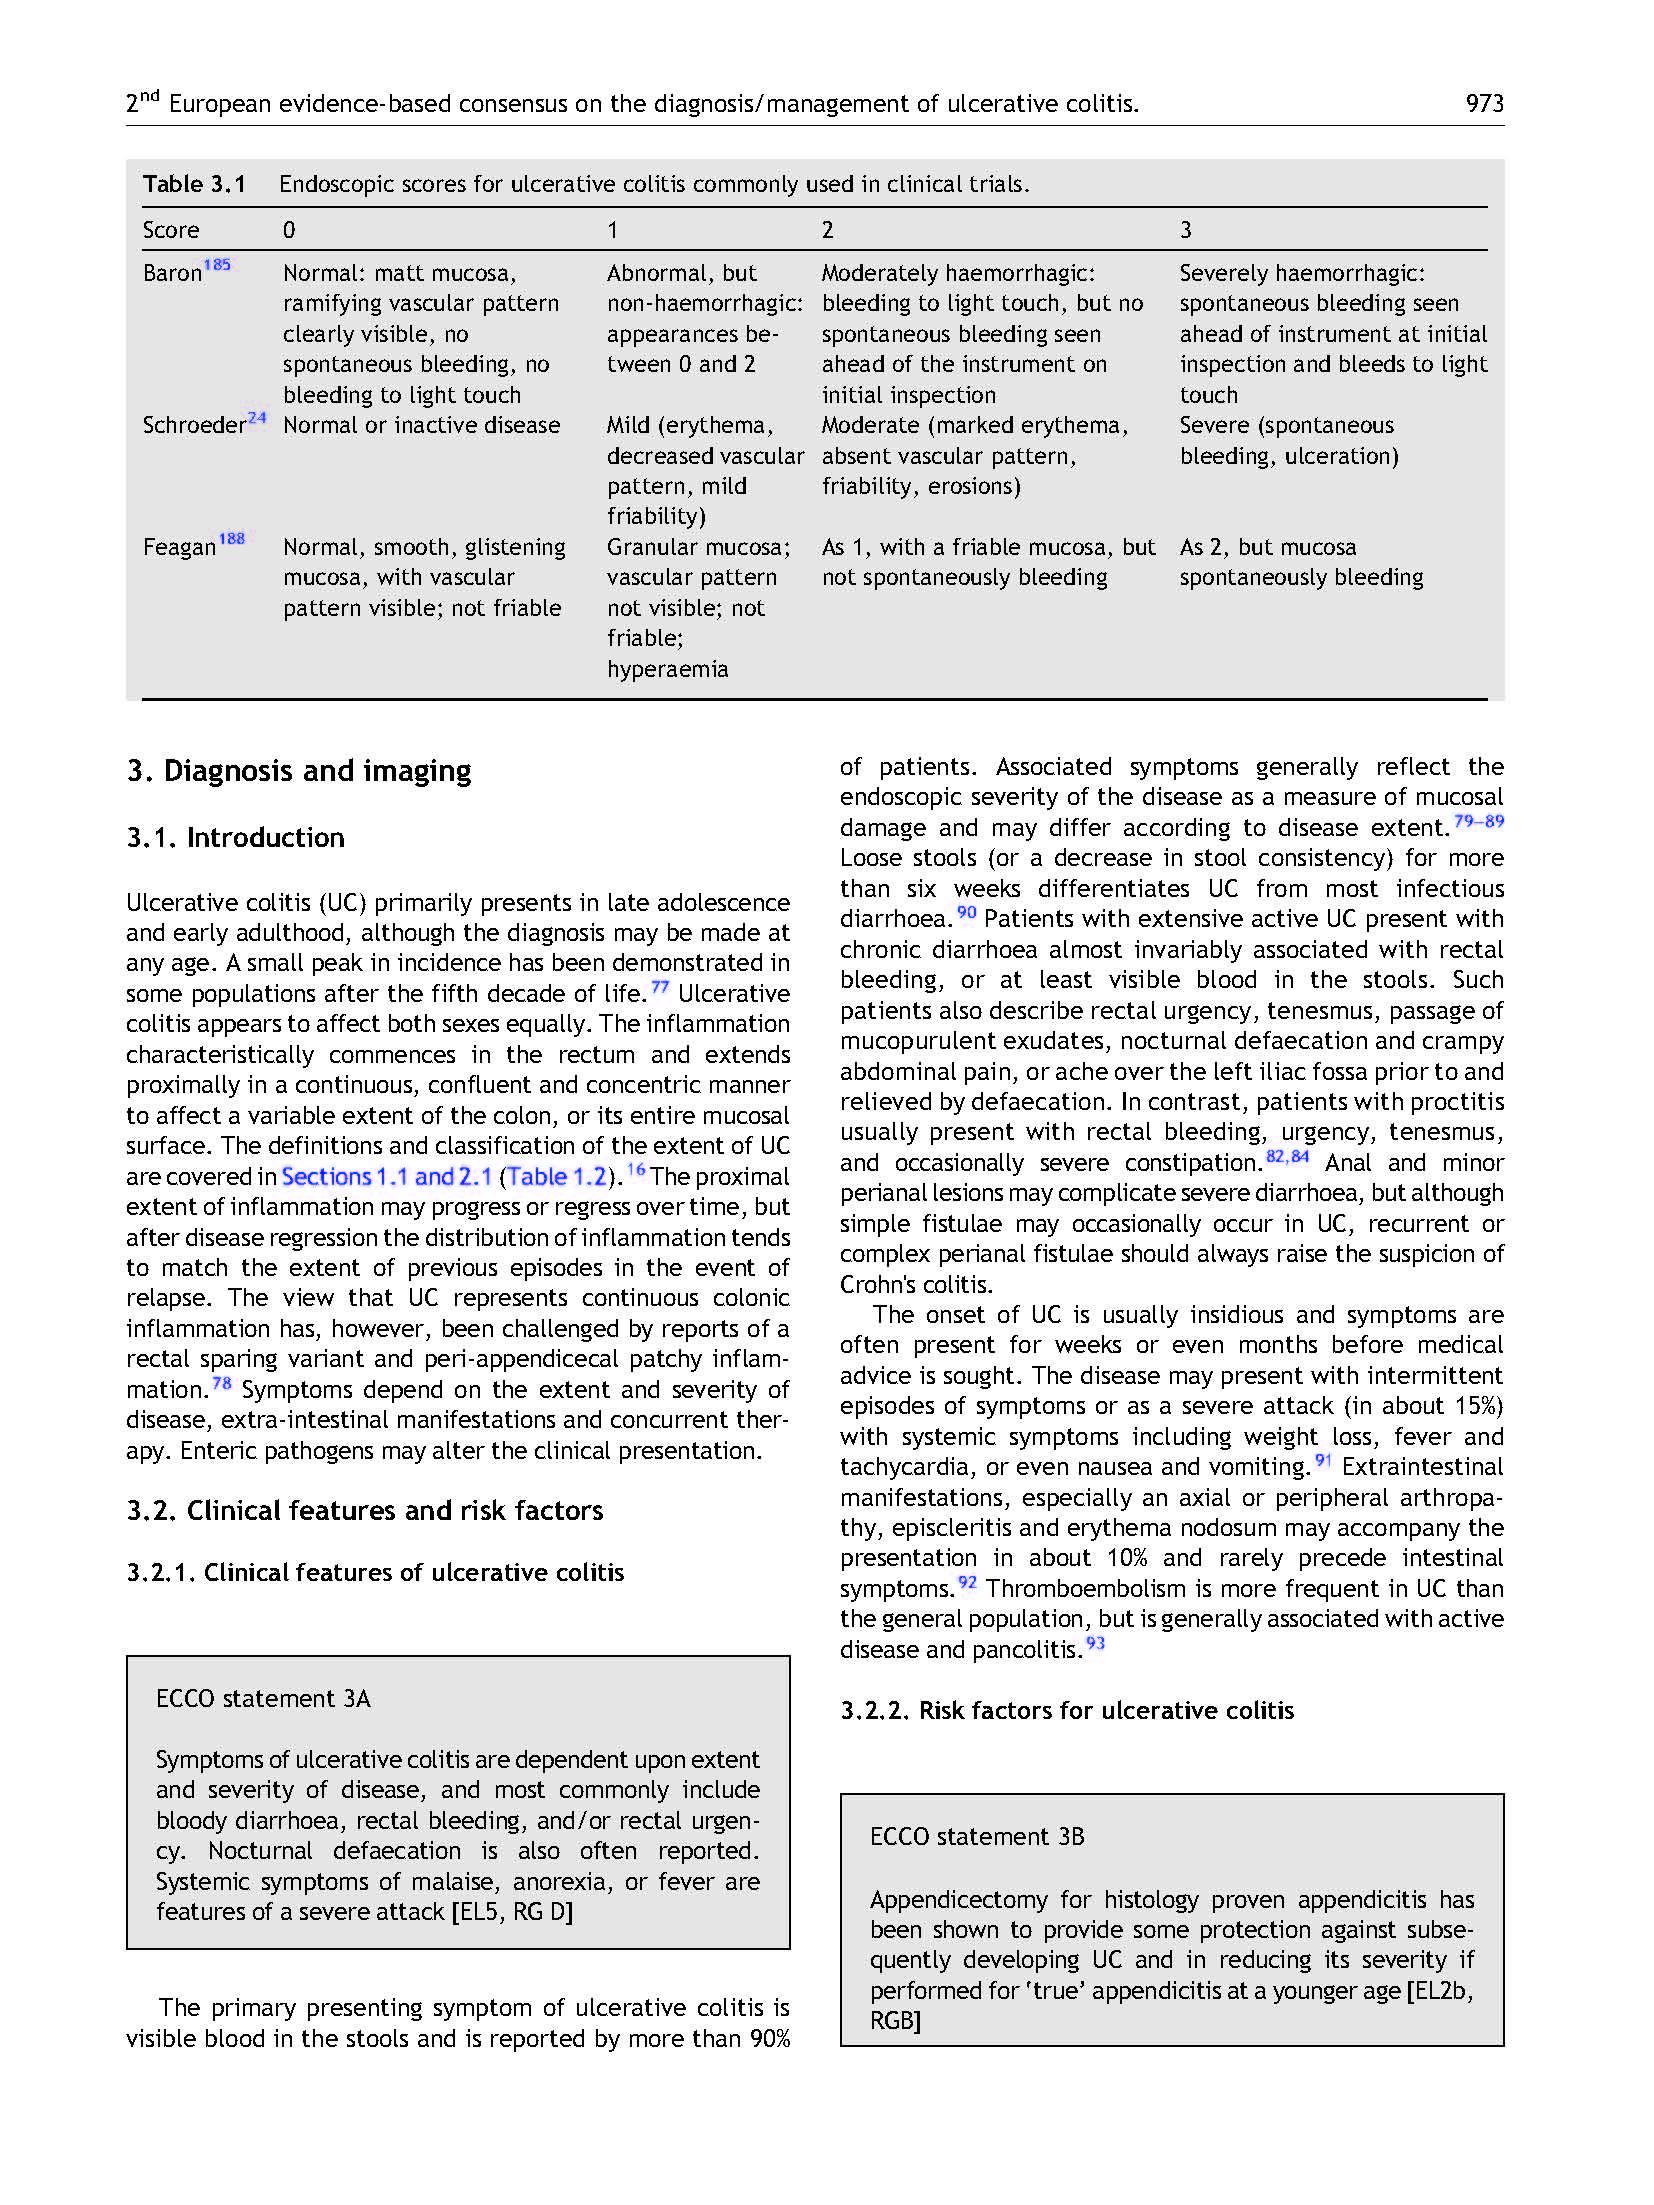 2012-ECCO第二版-欧洲询证共识:溃疡性结肠炎的诊断和处理—定义与诊断_页面_09.jpg